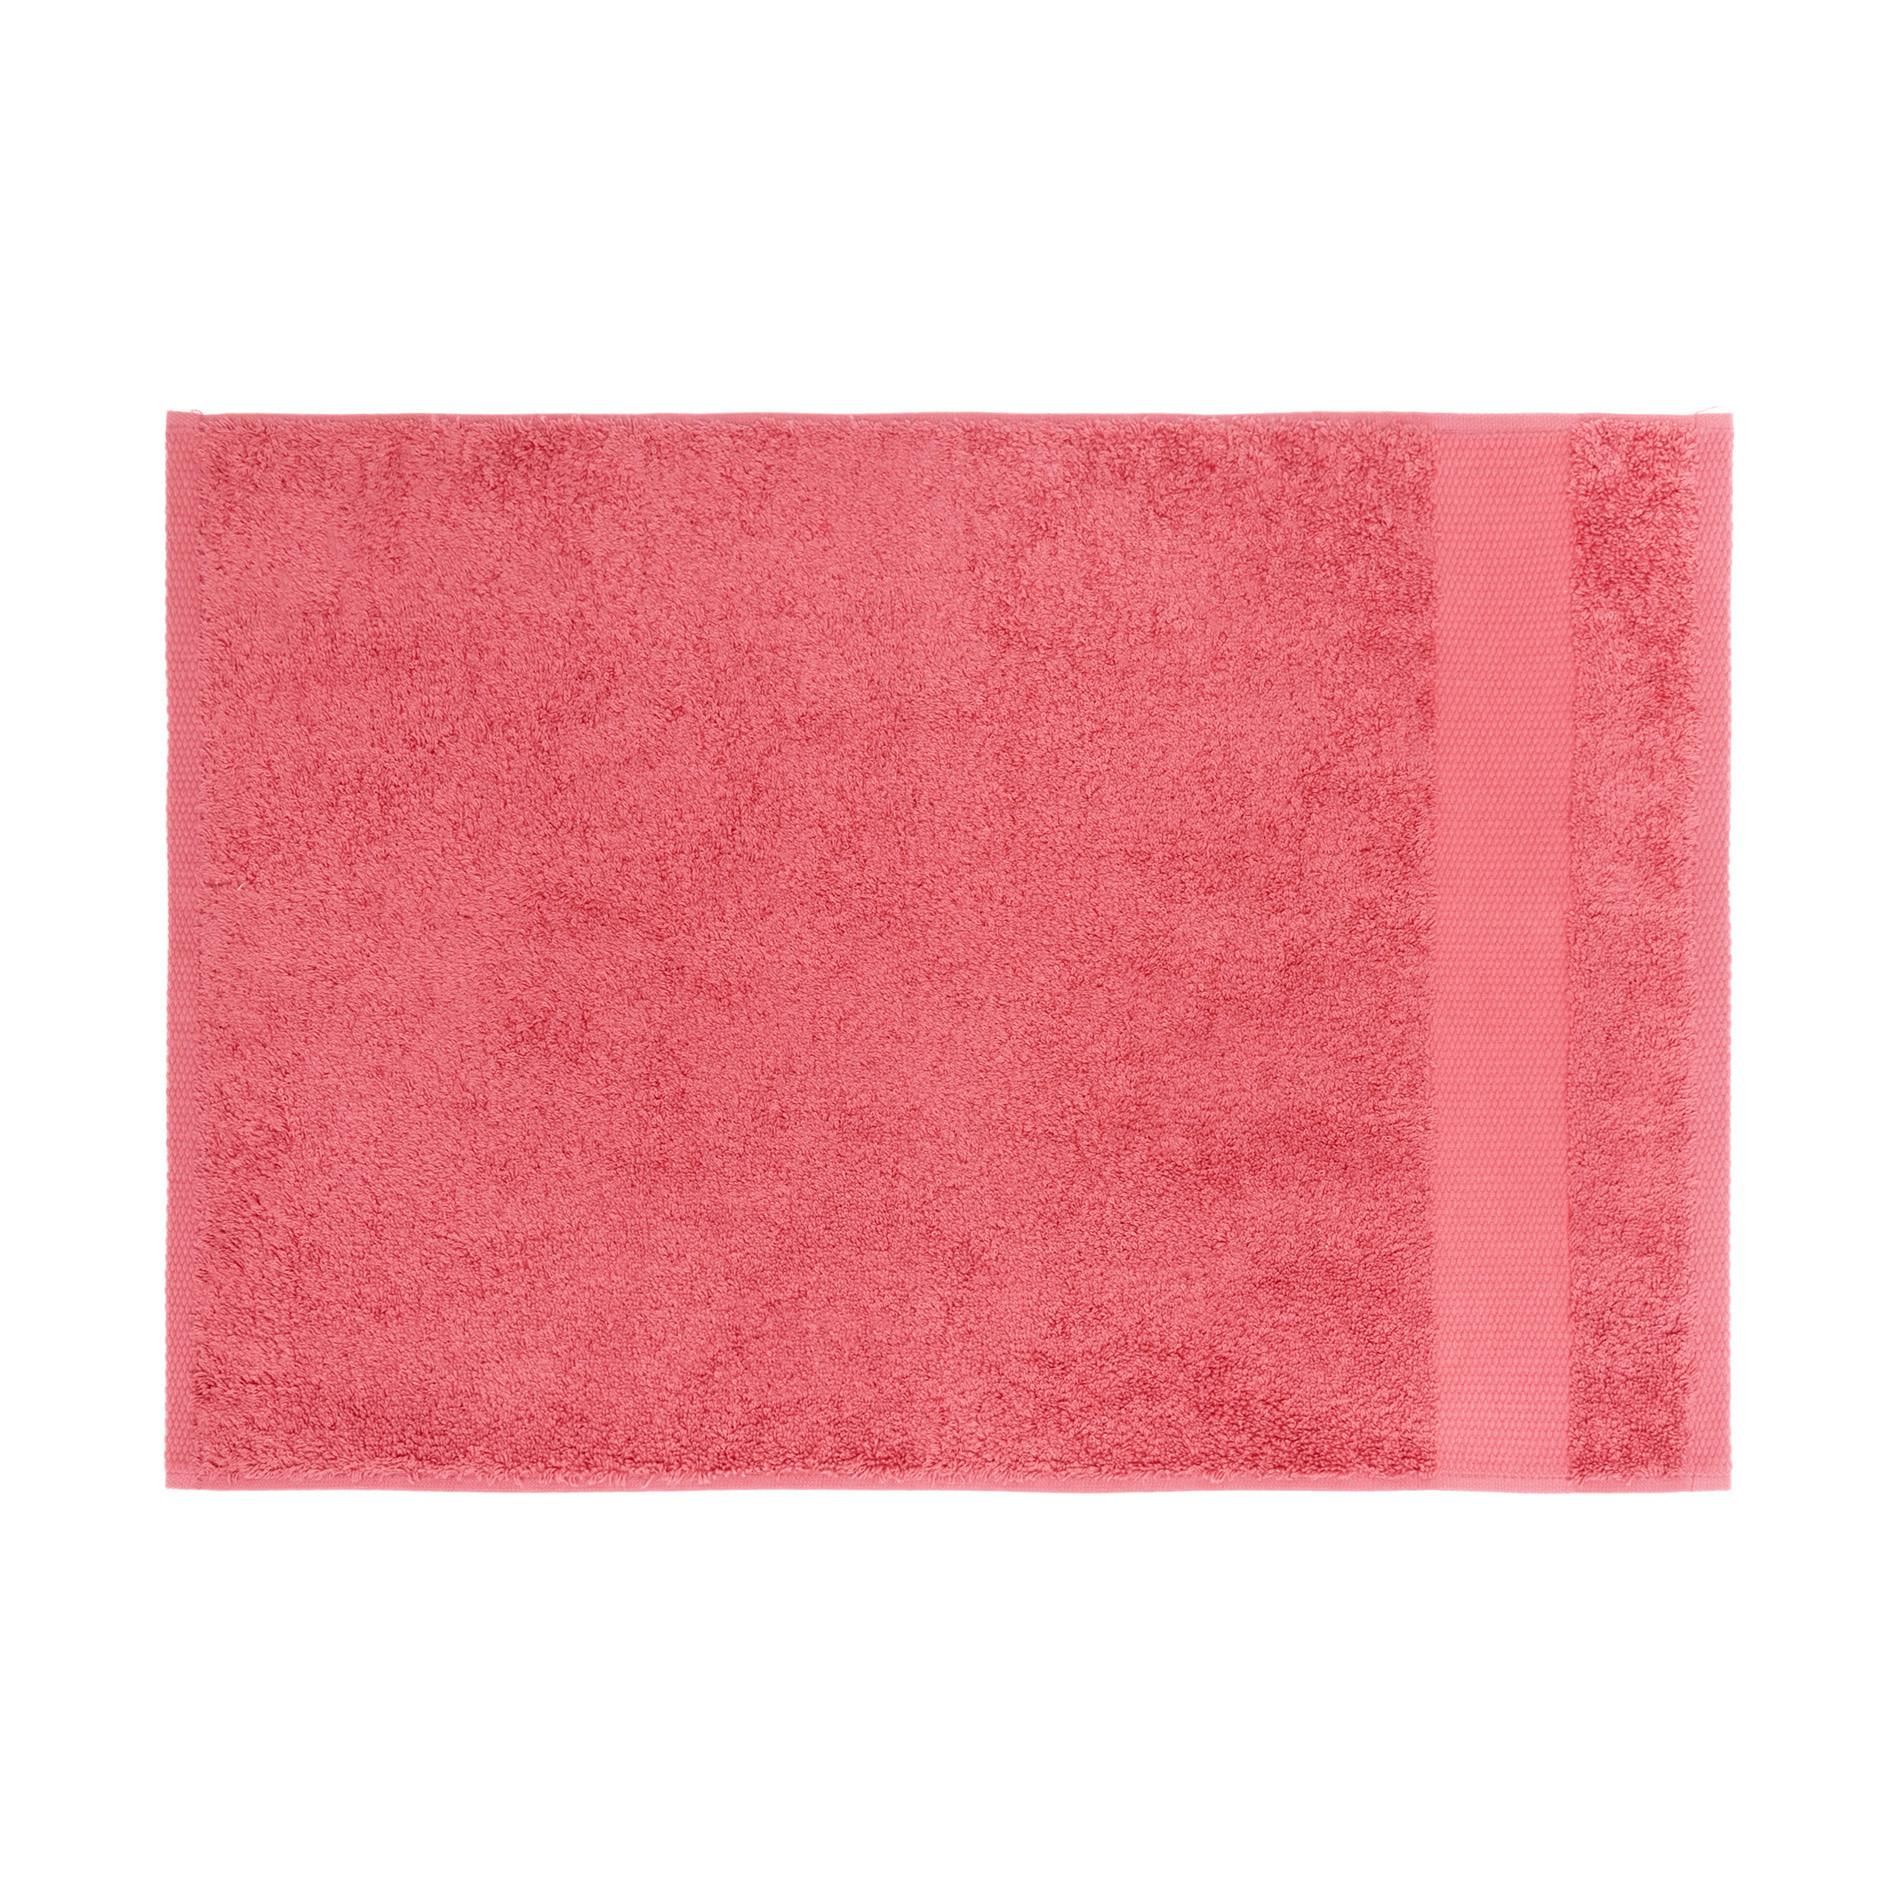 Asciugamano spugna di puro cotone Zefiro, Rosso fragola, large image number 2